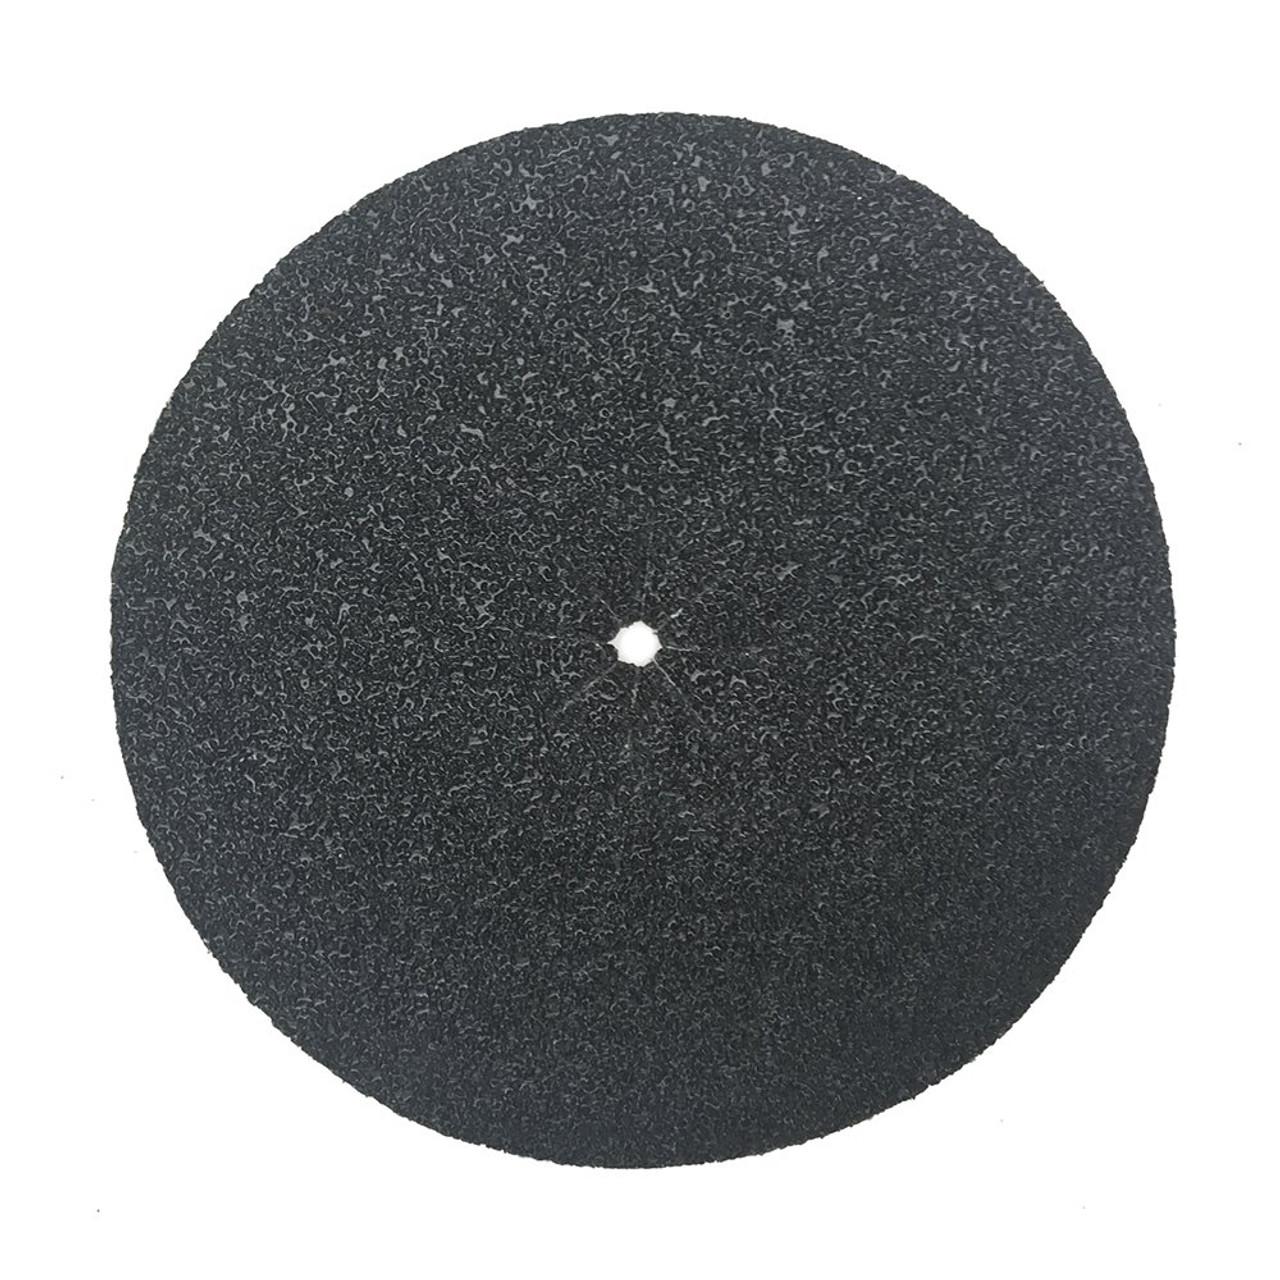 "50 Pack 4.5/"" Silicon Carbide Resin Fiber Discs 36 Grit 4-1//2 Inch Sanding Disc"